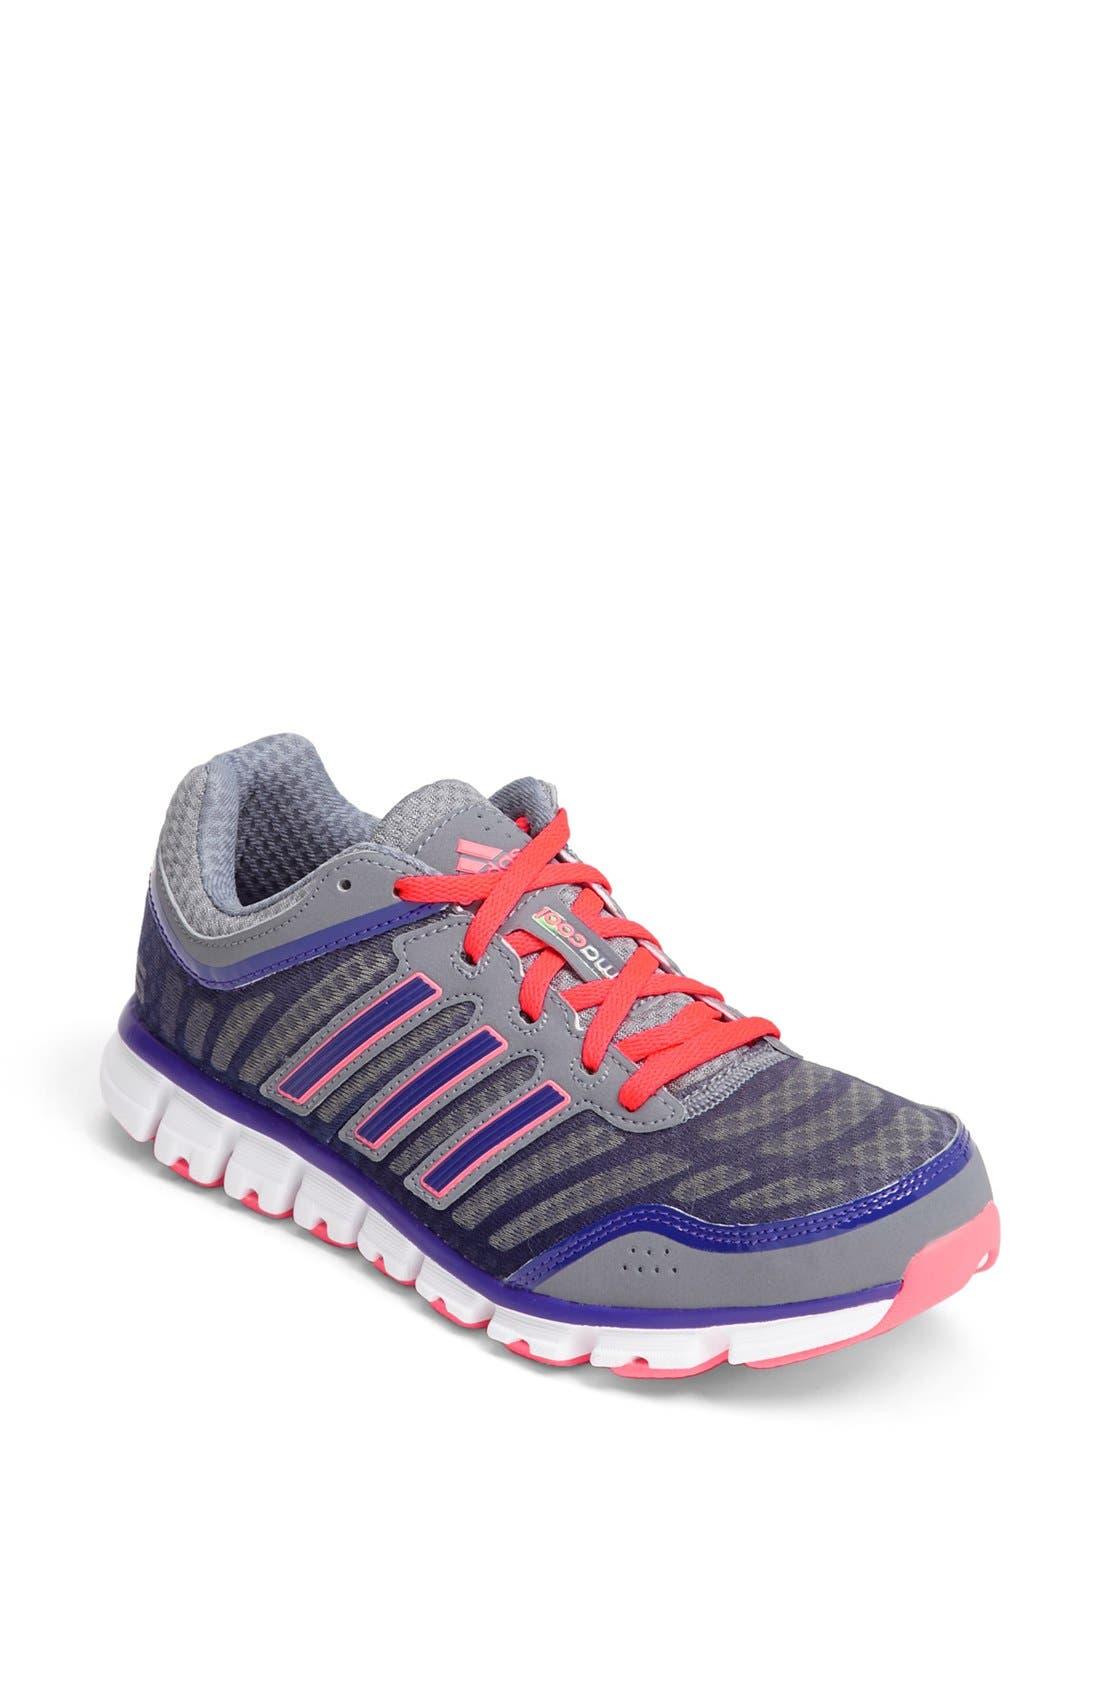 Alternate Image 1 Selected - adidas 'CLIMACOOL® Aerate' Running Shoe (Women)